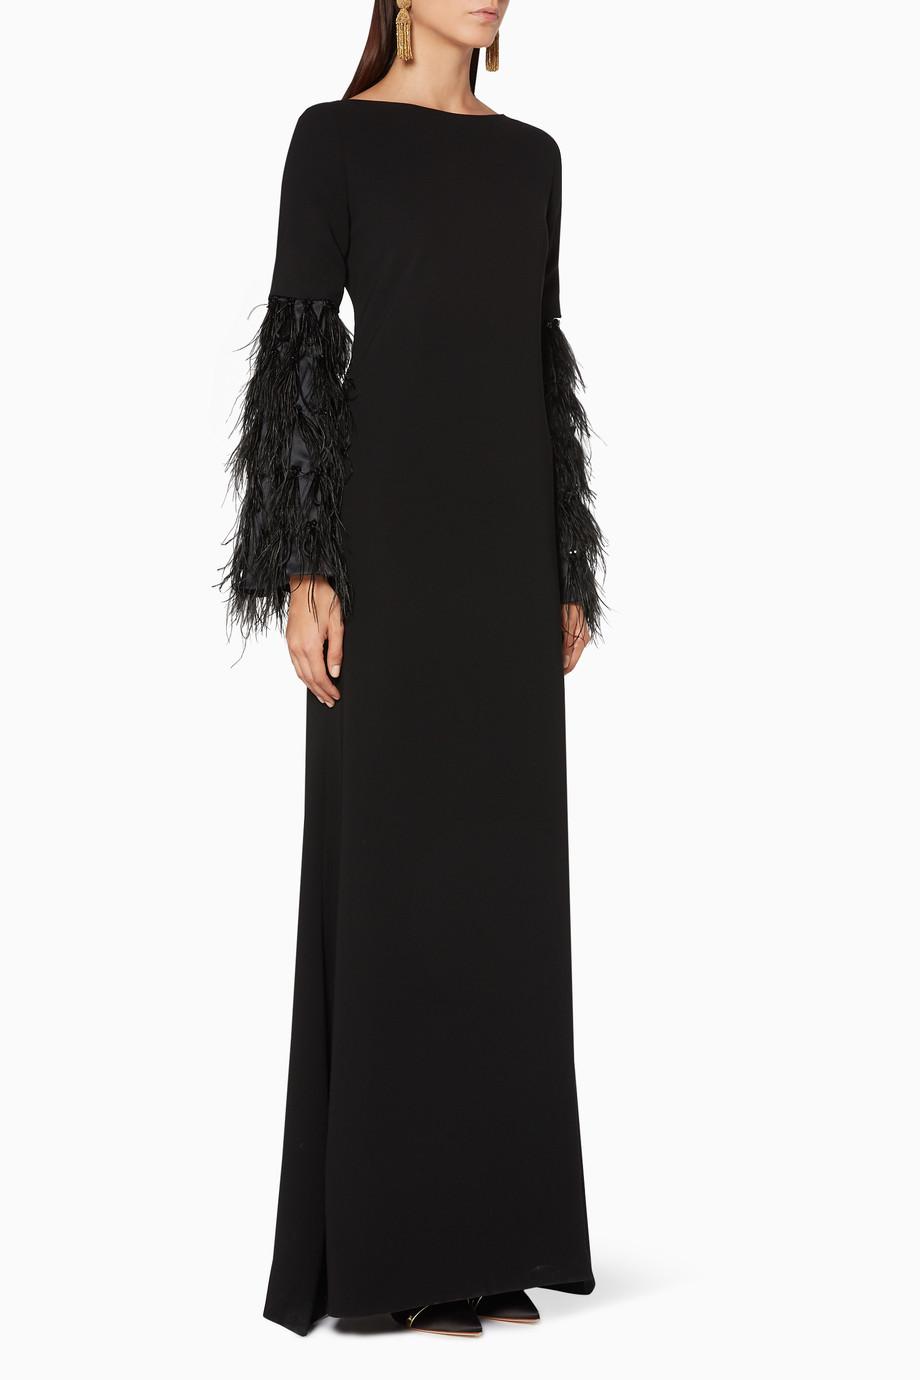 23cc00565 تسوق فستان سهرة نور بأكمام متعددة أسود Leal Daccarett أسود للنساء ...